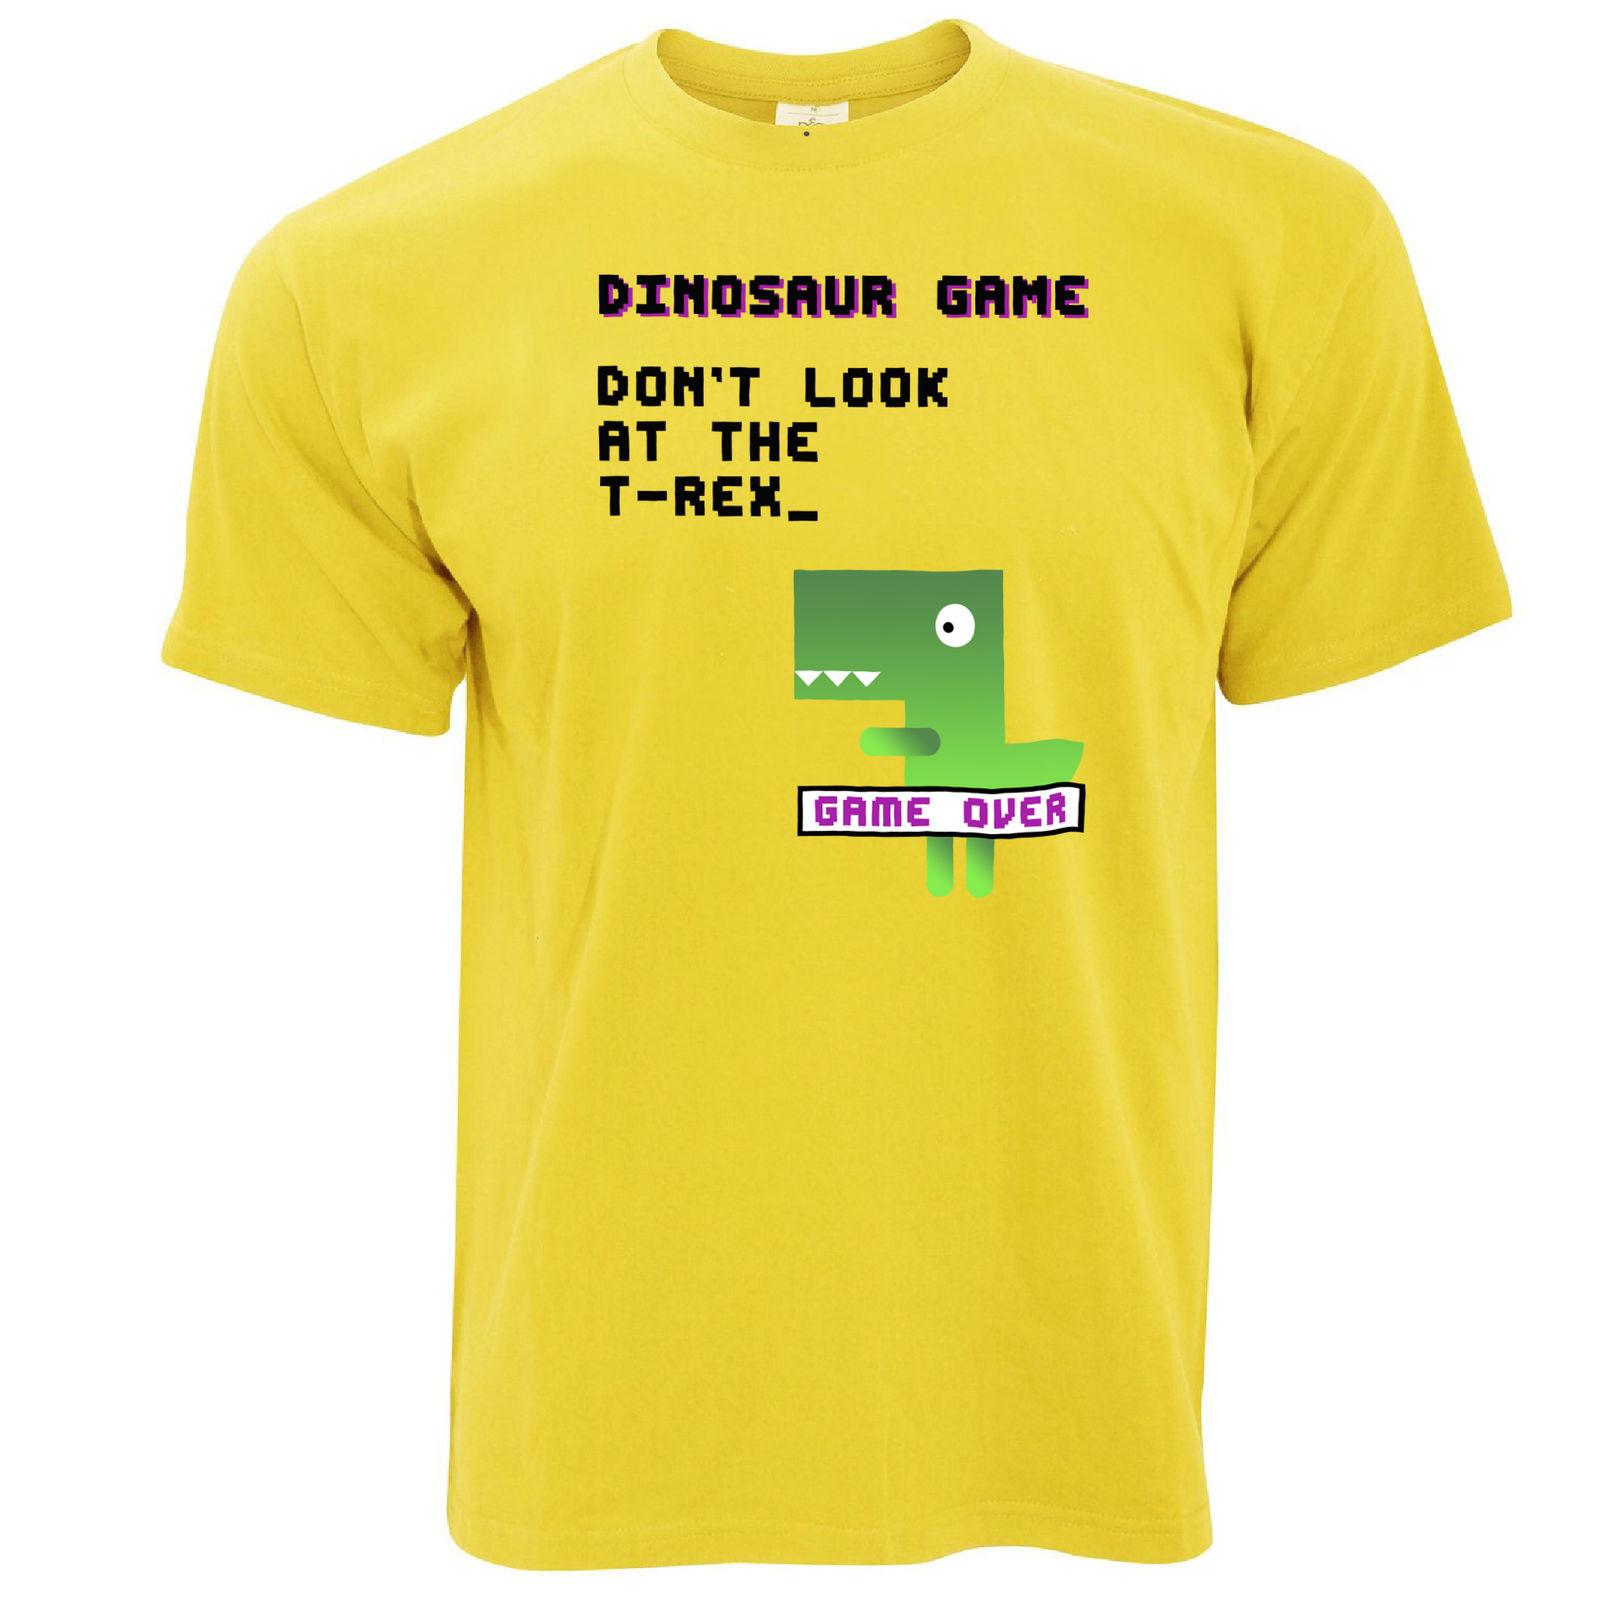 The Dinosaur T Rex Game 80s Console Visual Joke Print Logo Design Mens T-Shirt Men High Quality Tees top tee